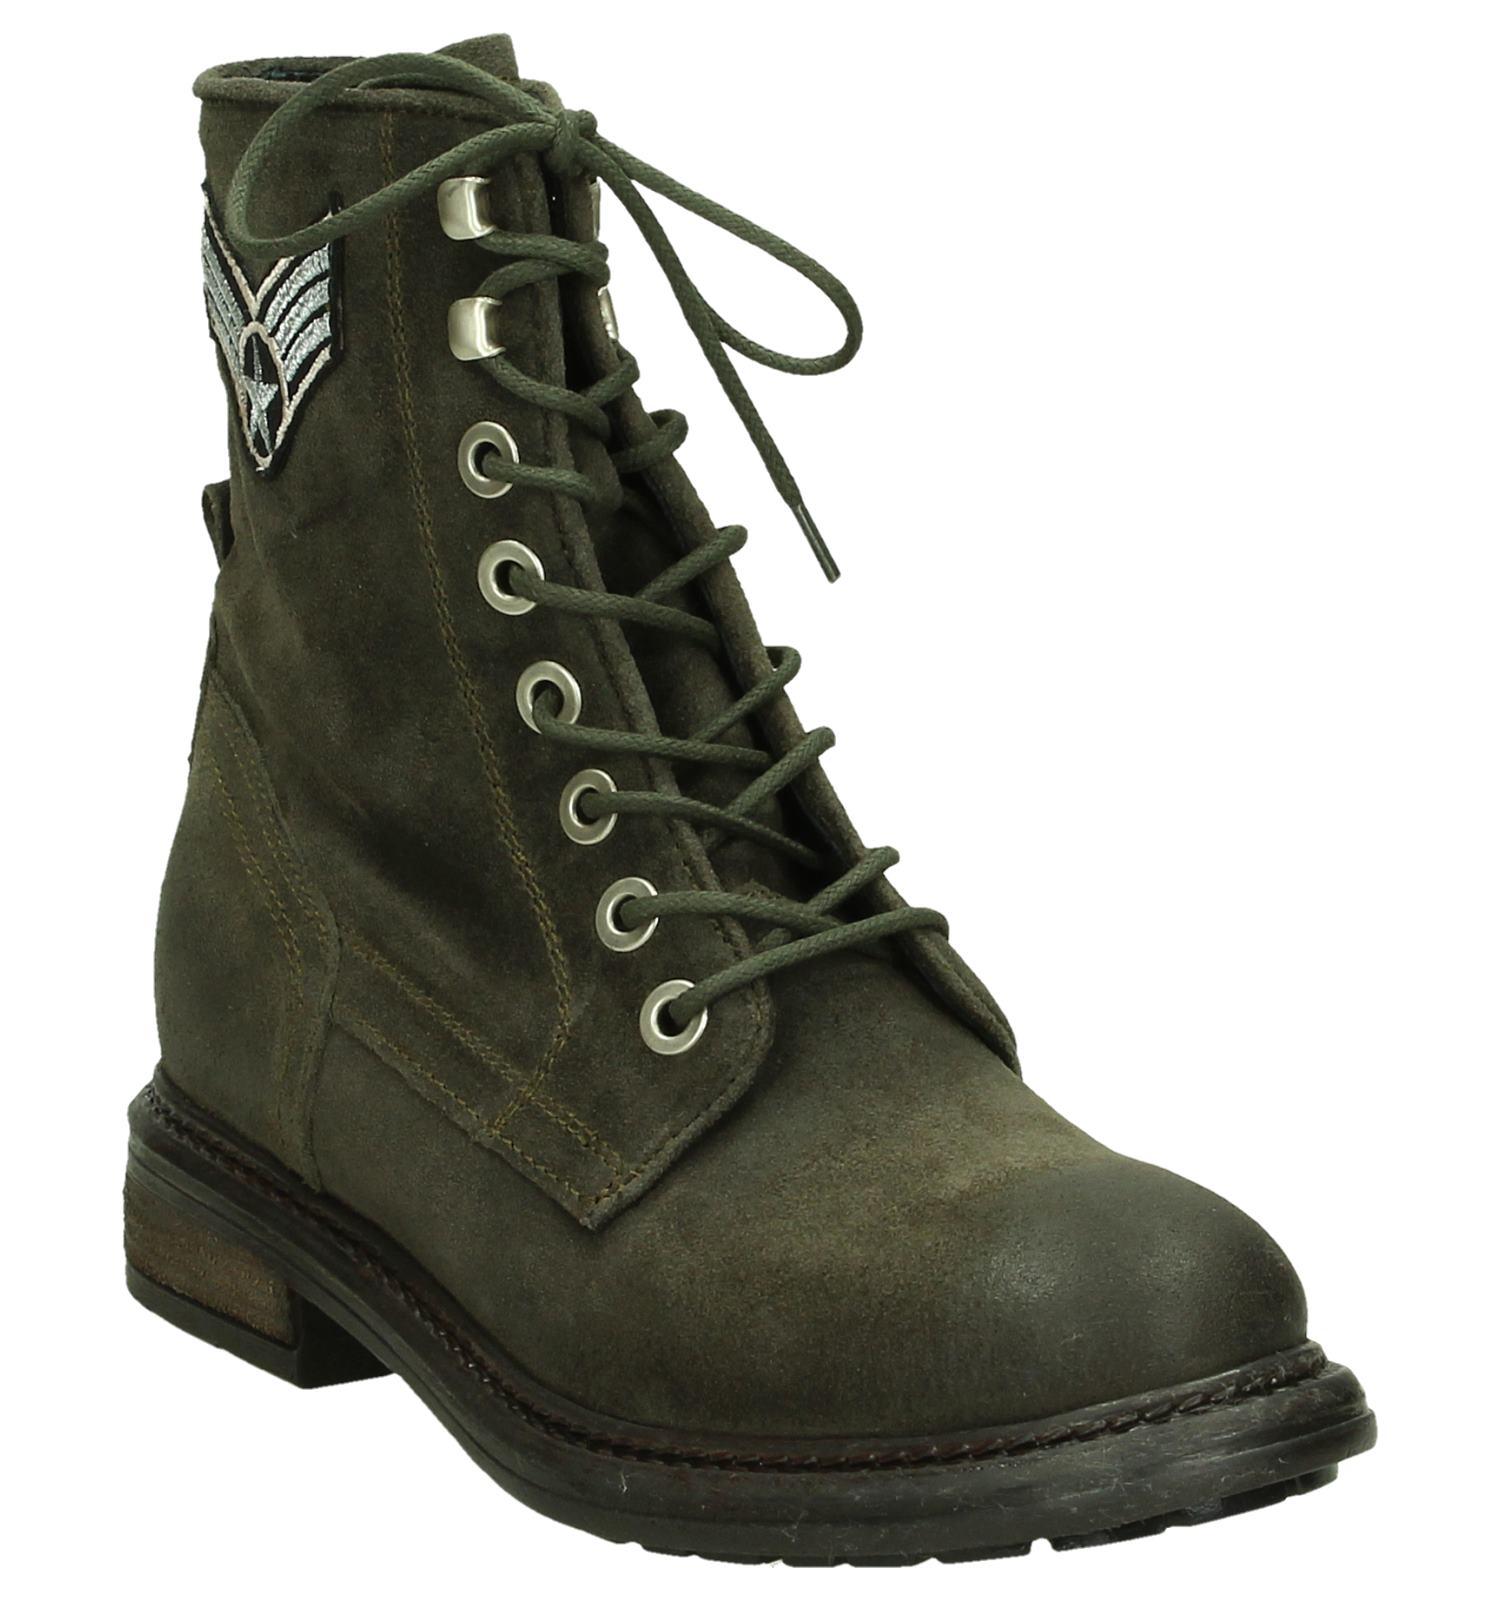 Army Rose Boots Kaki Kaki Army Boots Miss E29IYeWHD